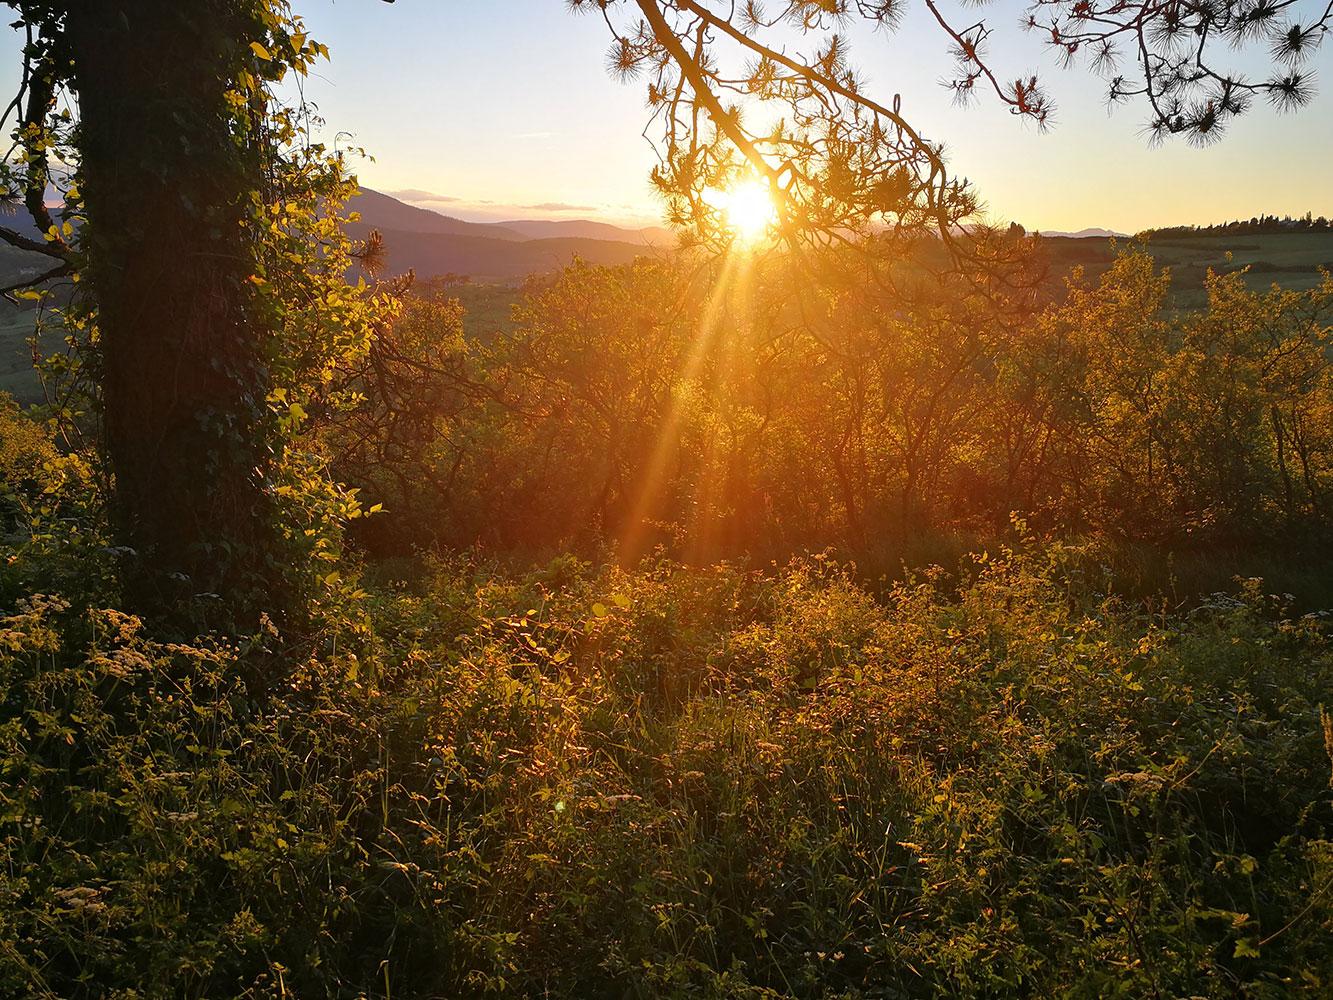 tuscany-sunset-via-degli-dei